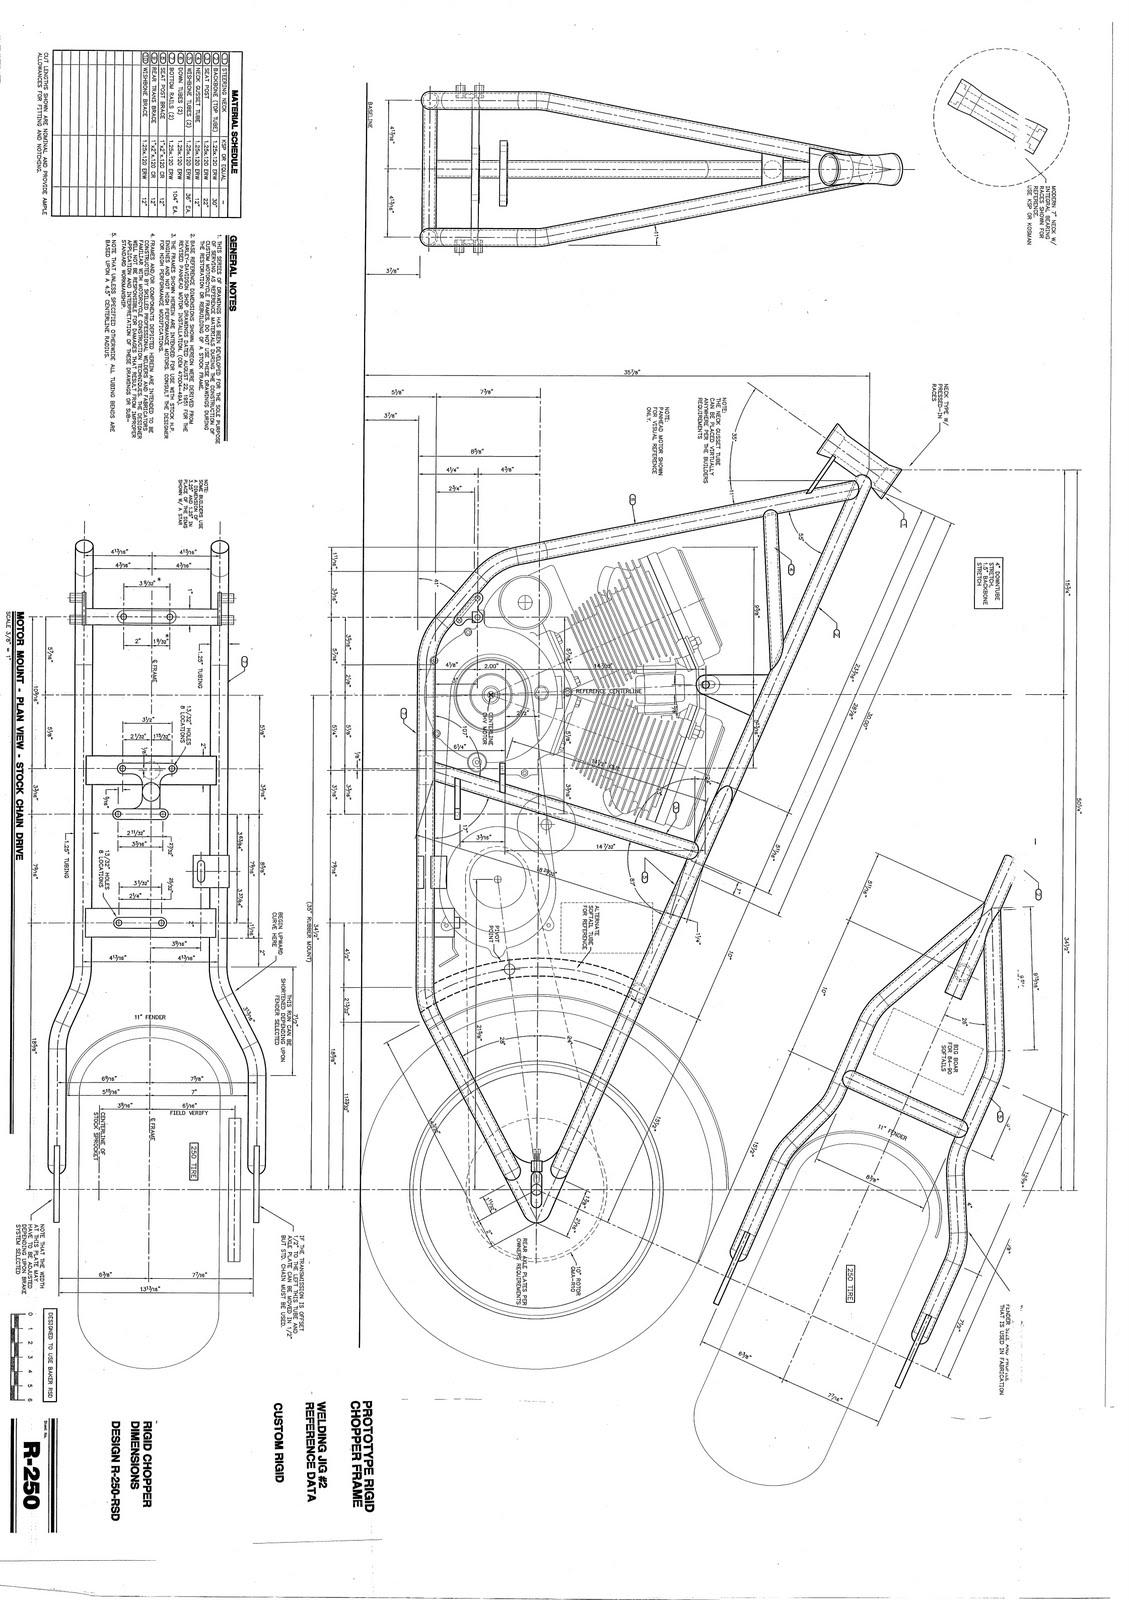 harley softail frame diagram 230 volt air conditioner wiring blog archives mnogosoftabell